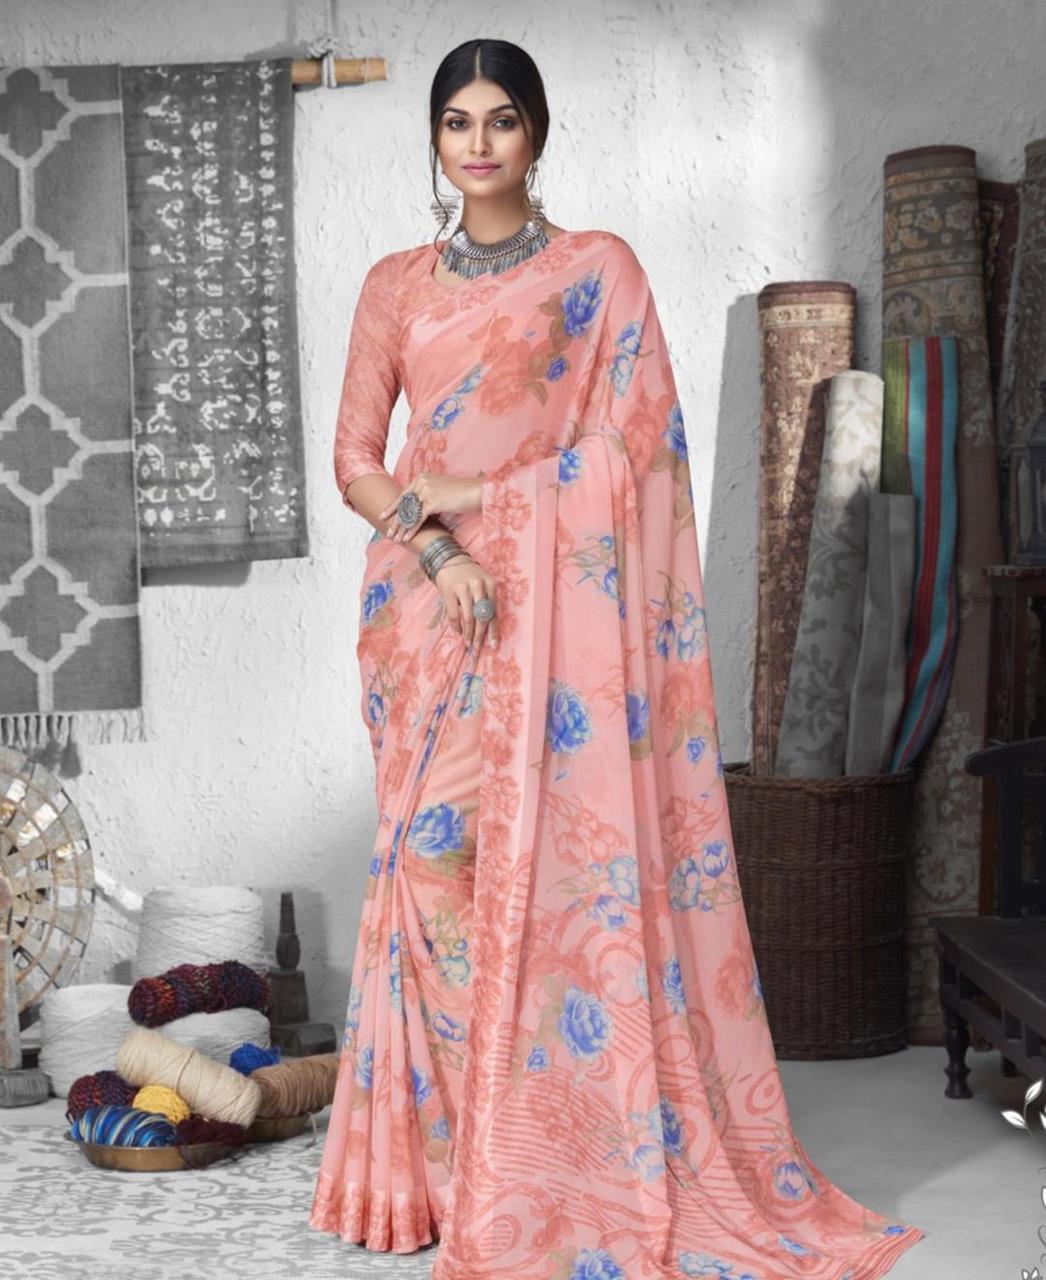 Printed Chiffon Saree in Peach